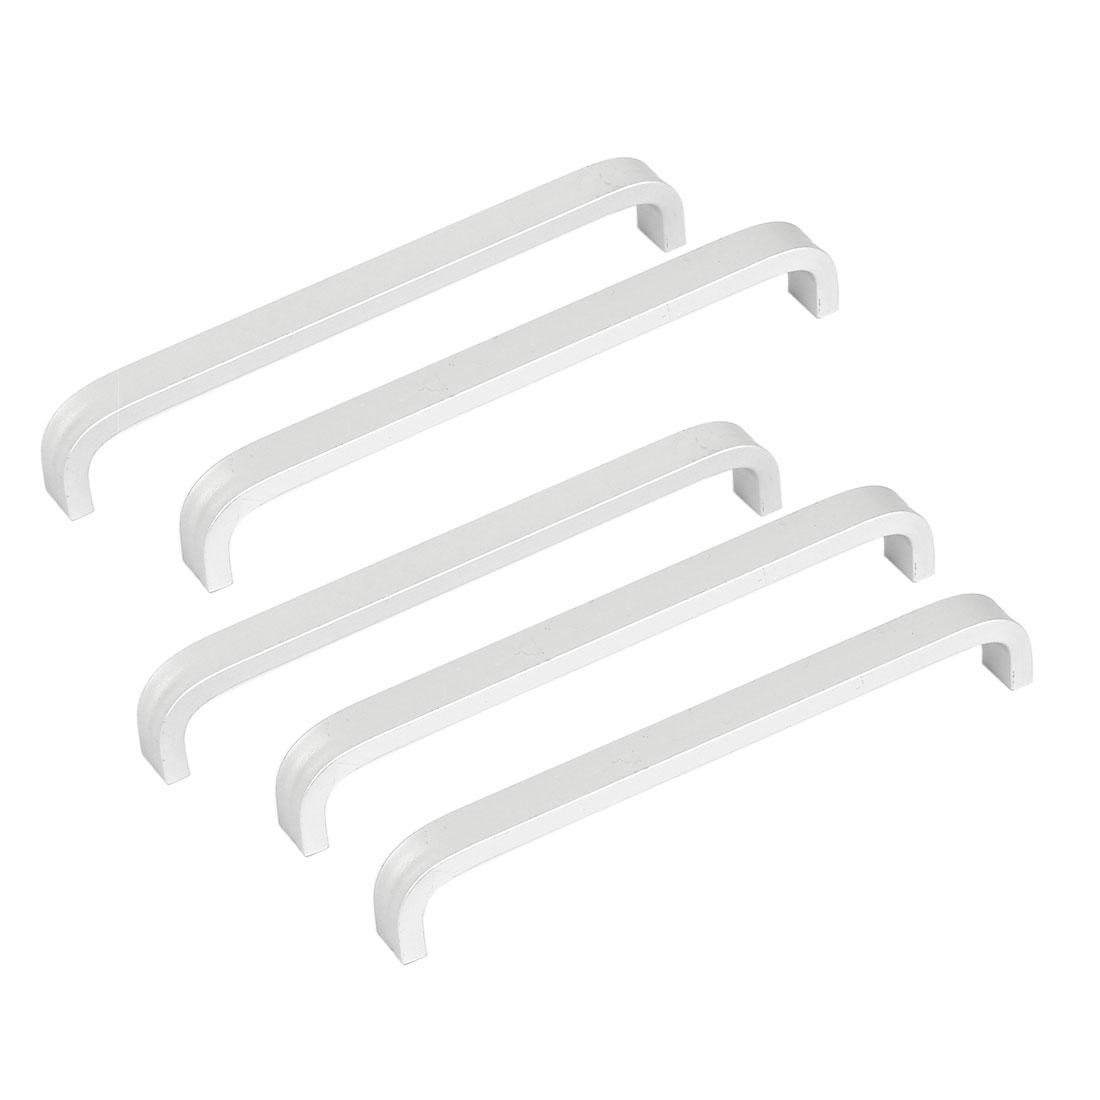 Drawer Cabinet Cupboard Closet Wardrobe Arch Shape Aluminium Pull Handle 5pcs